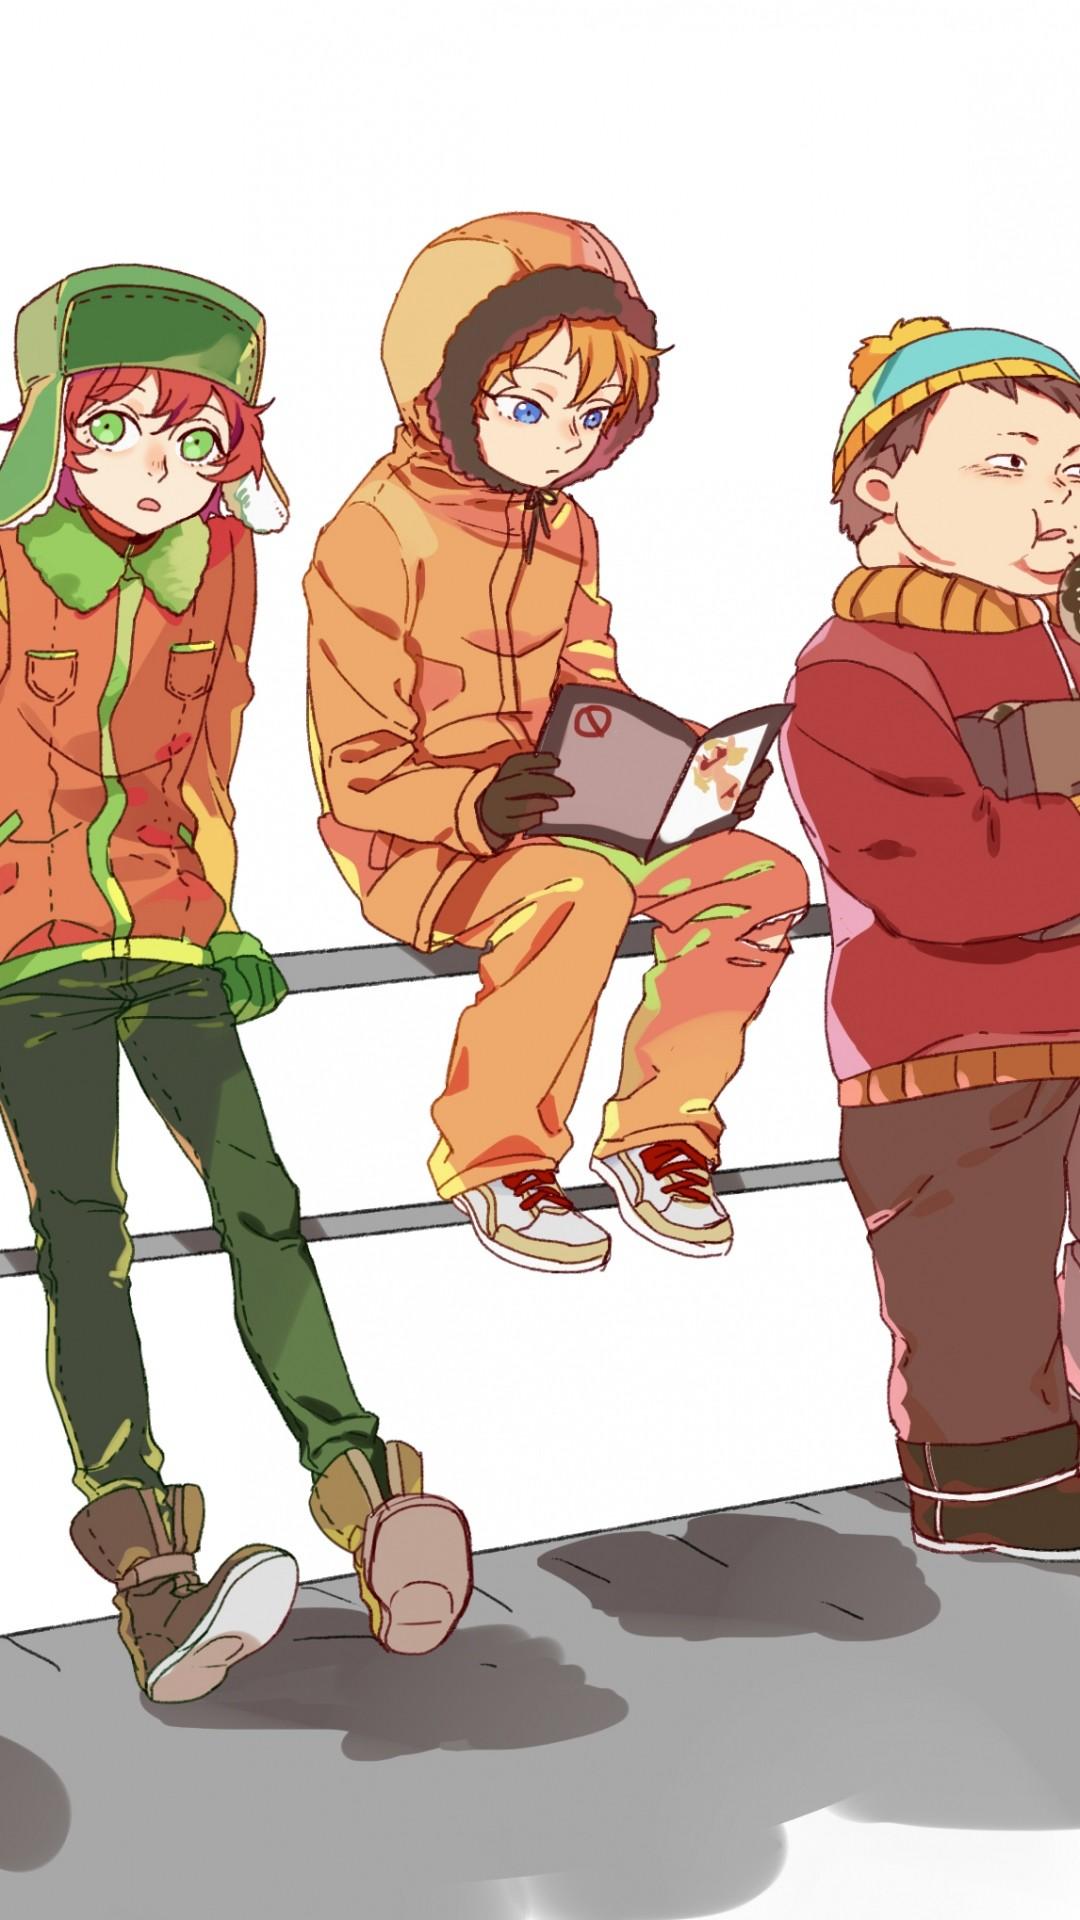 … Wallpaper Anime newrein south park anime stanley randall marsh eric  theodore cartman kenny mccormick kyle broflovski iPhone …